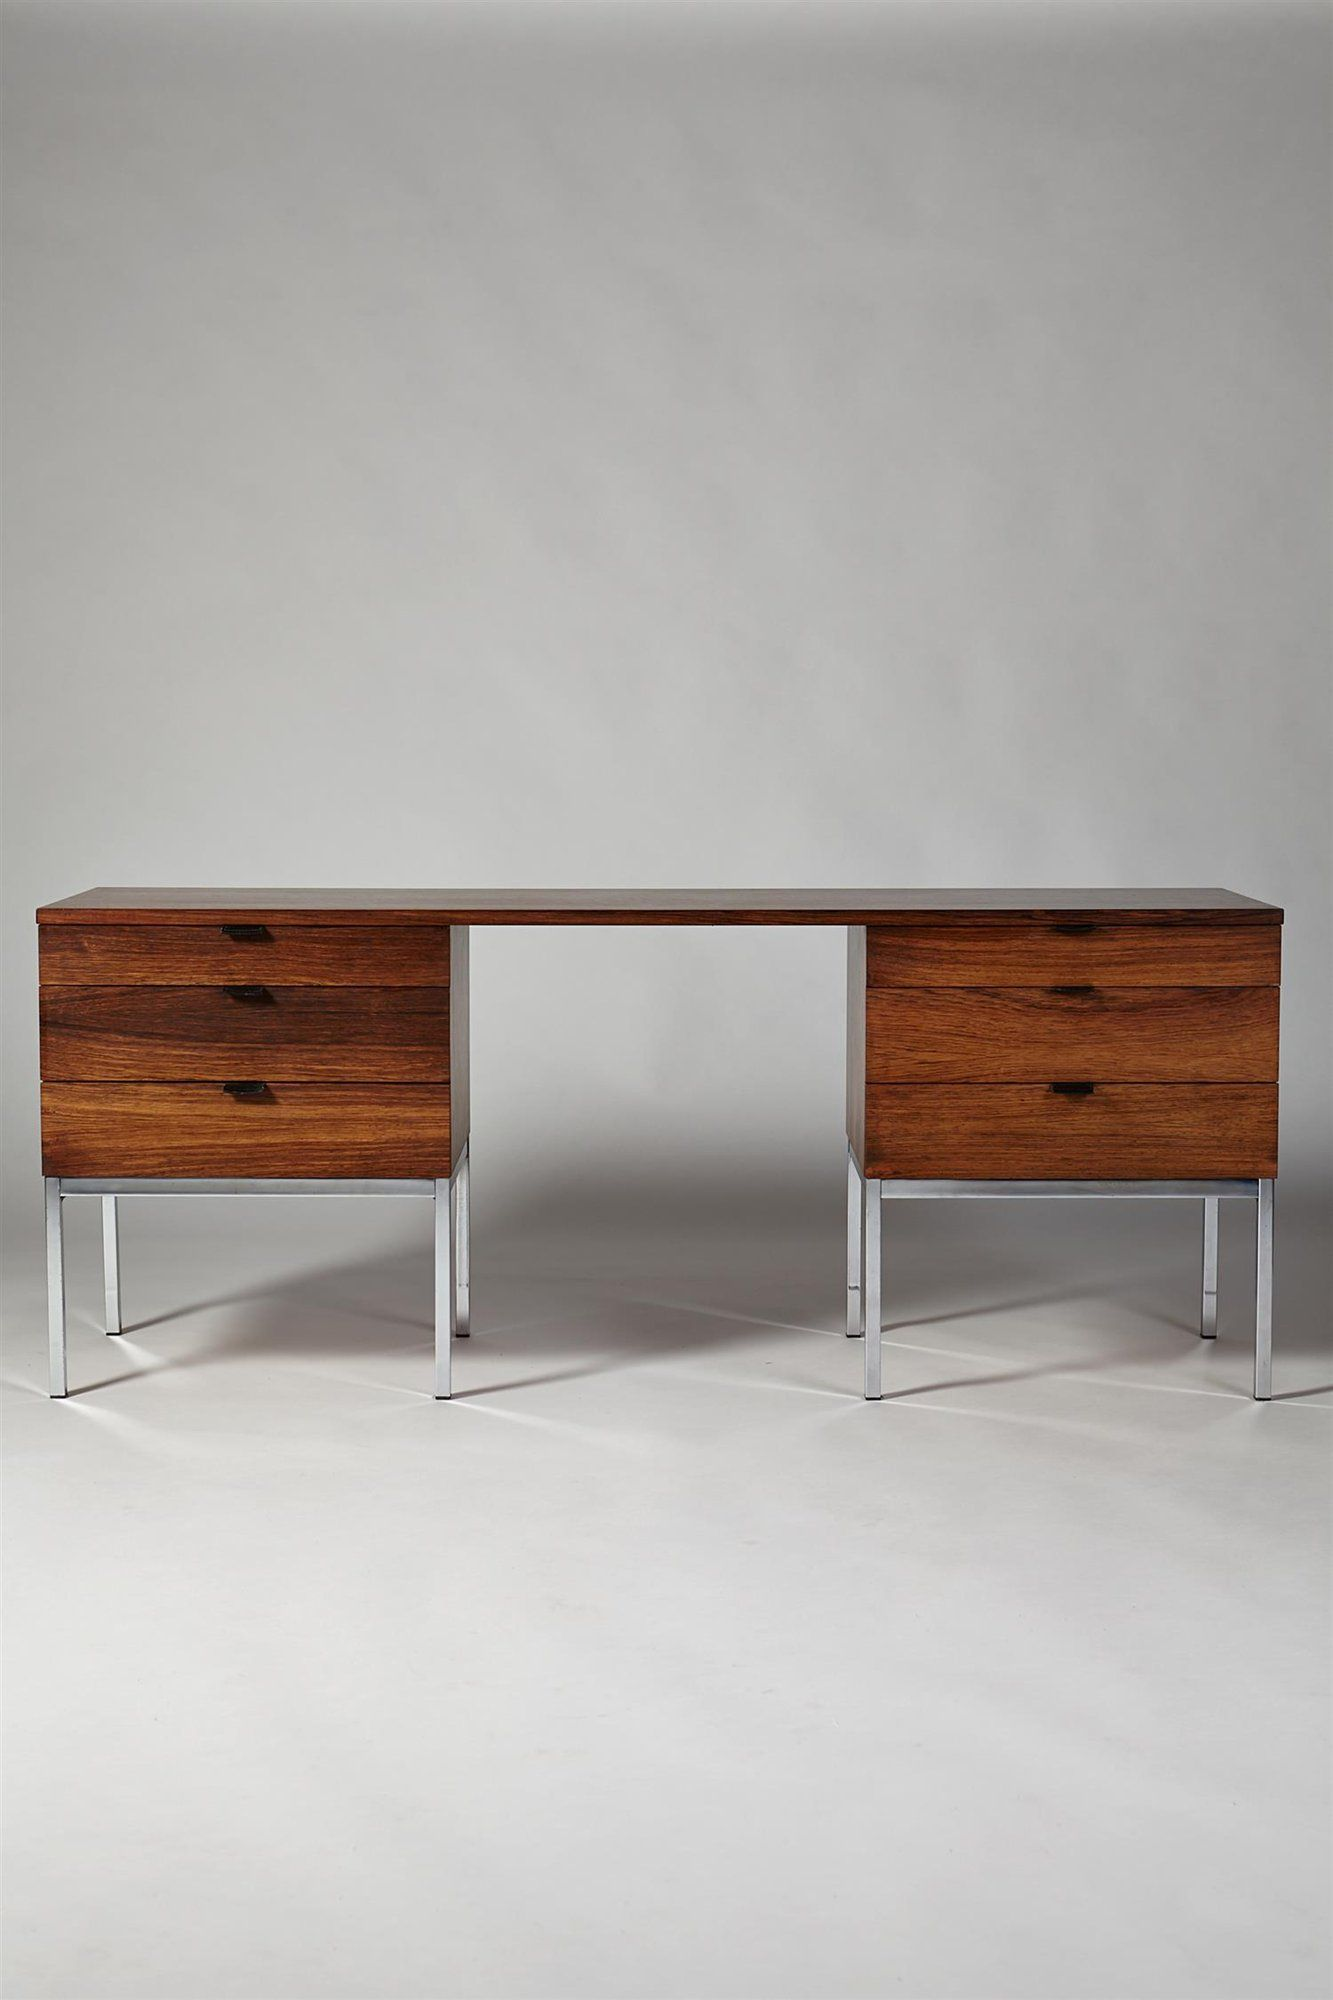 Florence Knoll For Knoll International Rosewood Chromed Steel Desk With Leather Drawer Pulls 1960s Vintage 1960s Home Mobilier Design Bureau